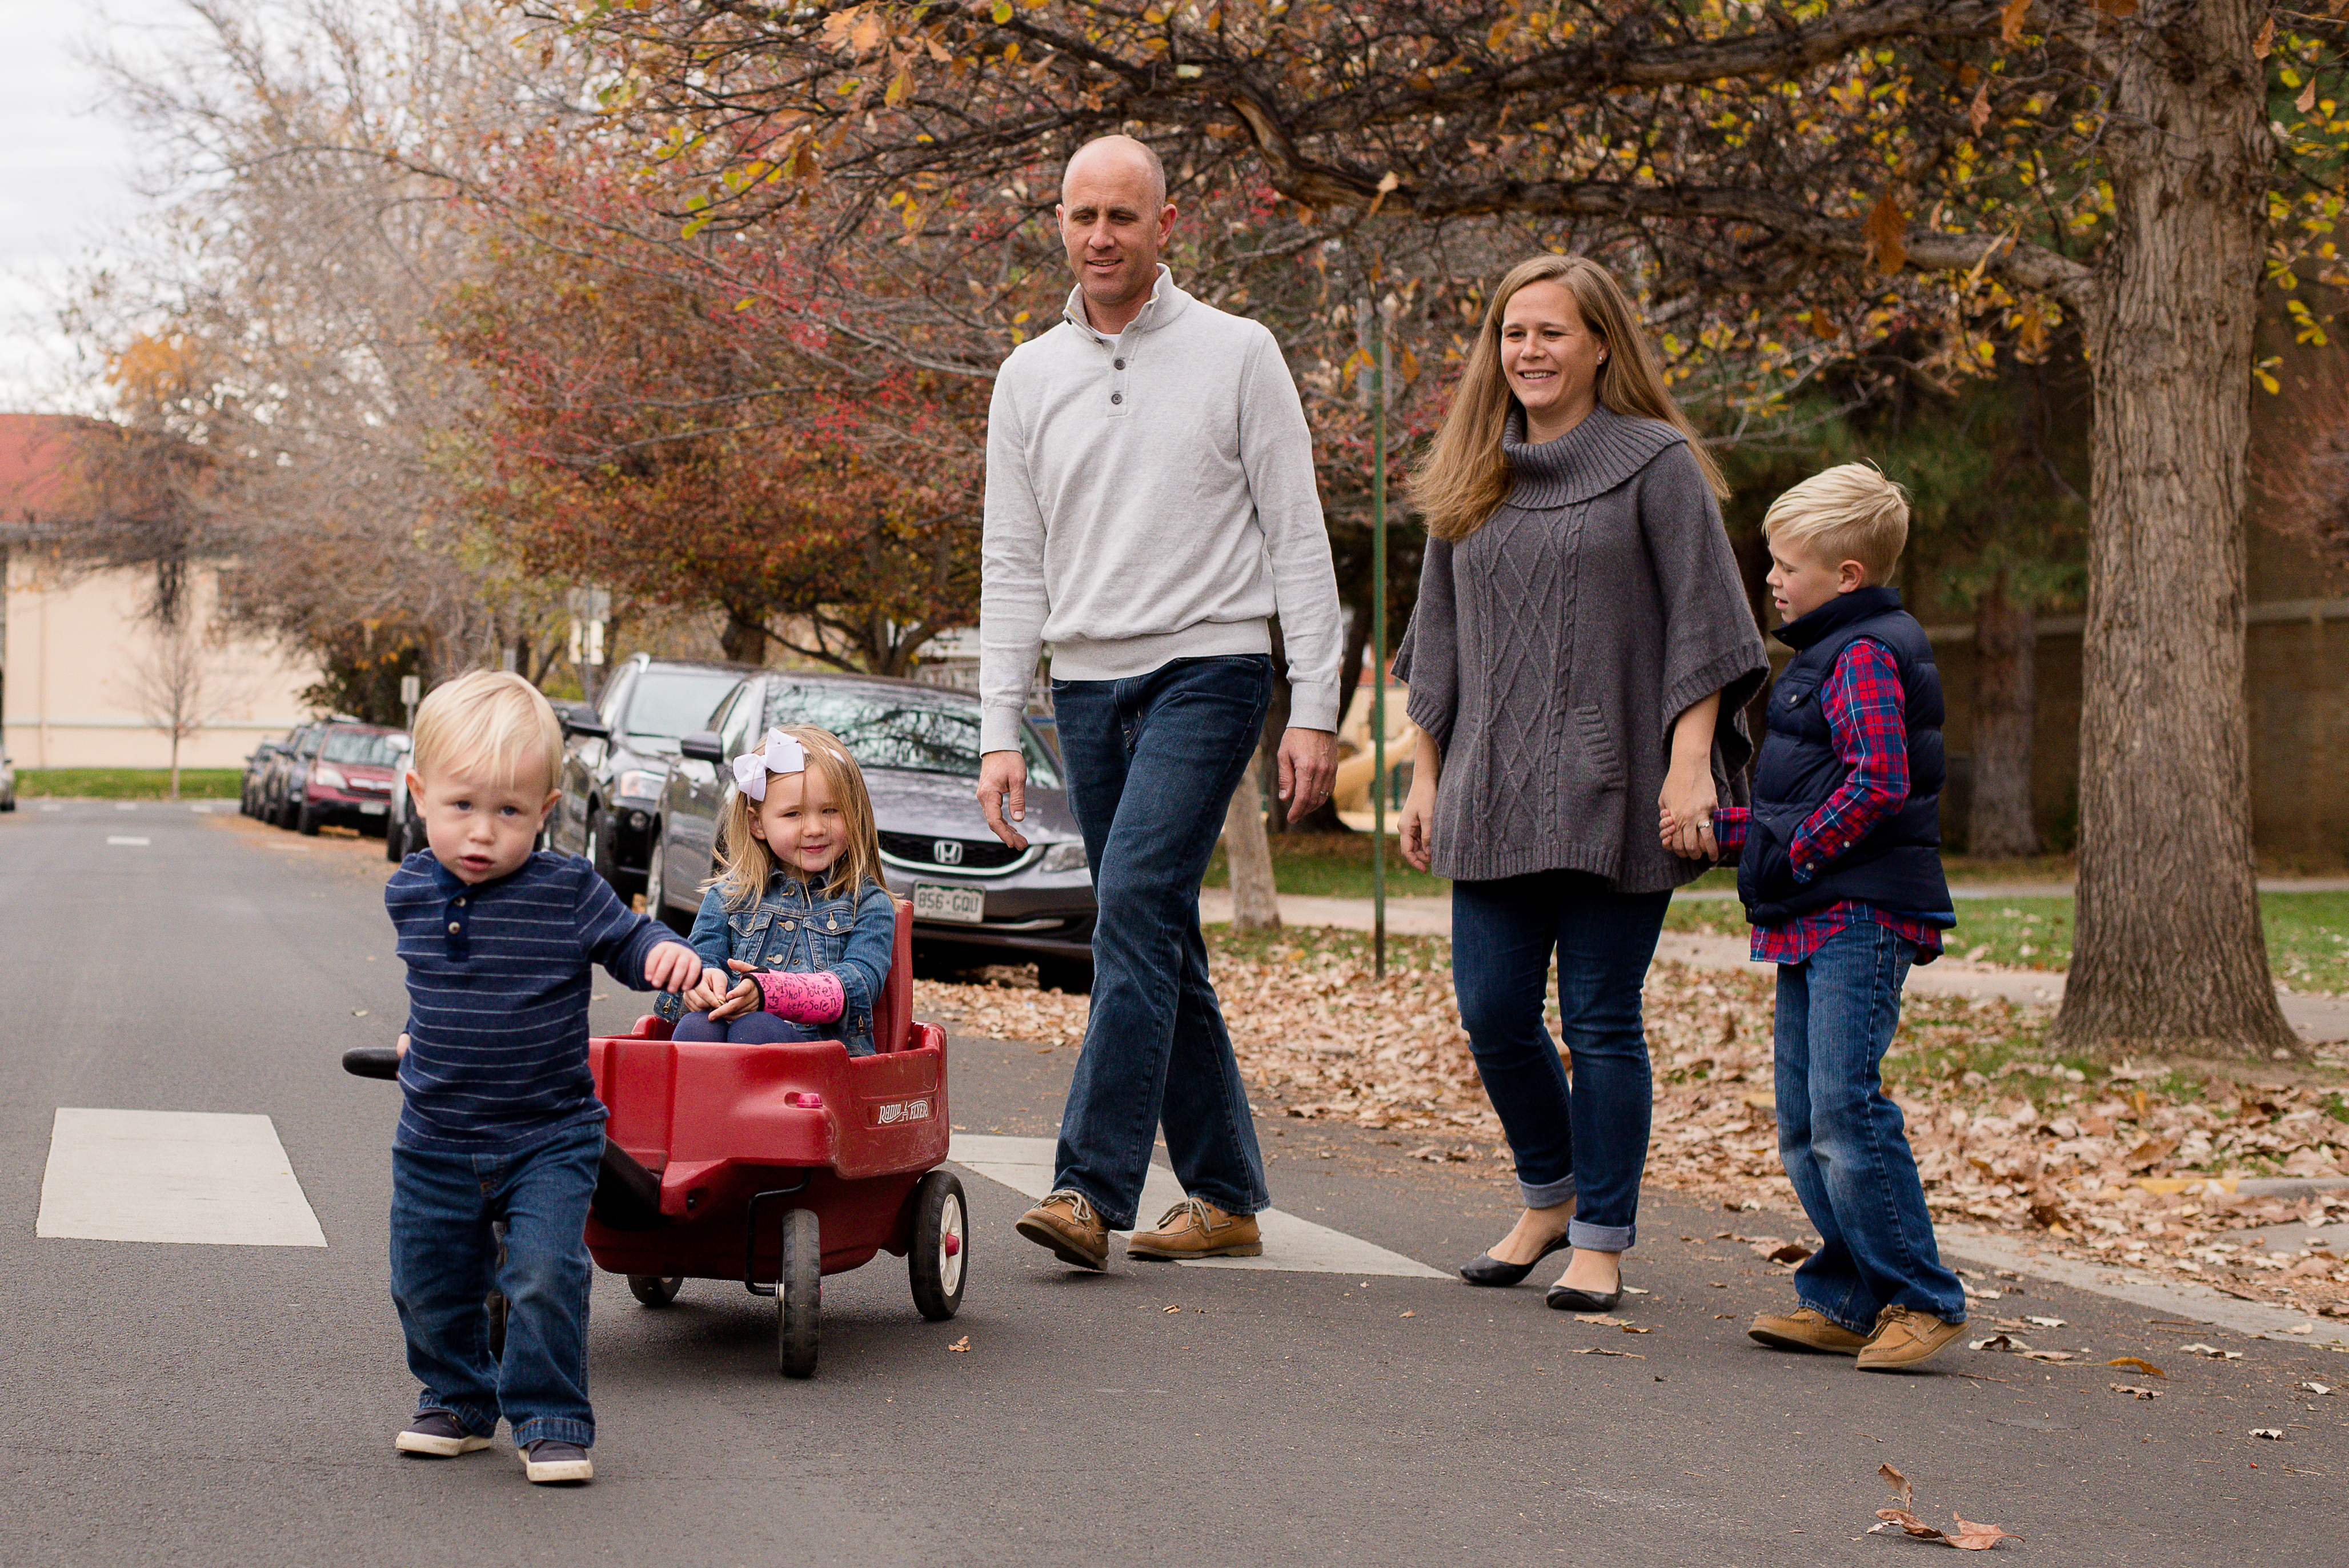 Family of 5 walking across street